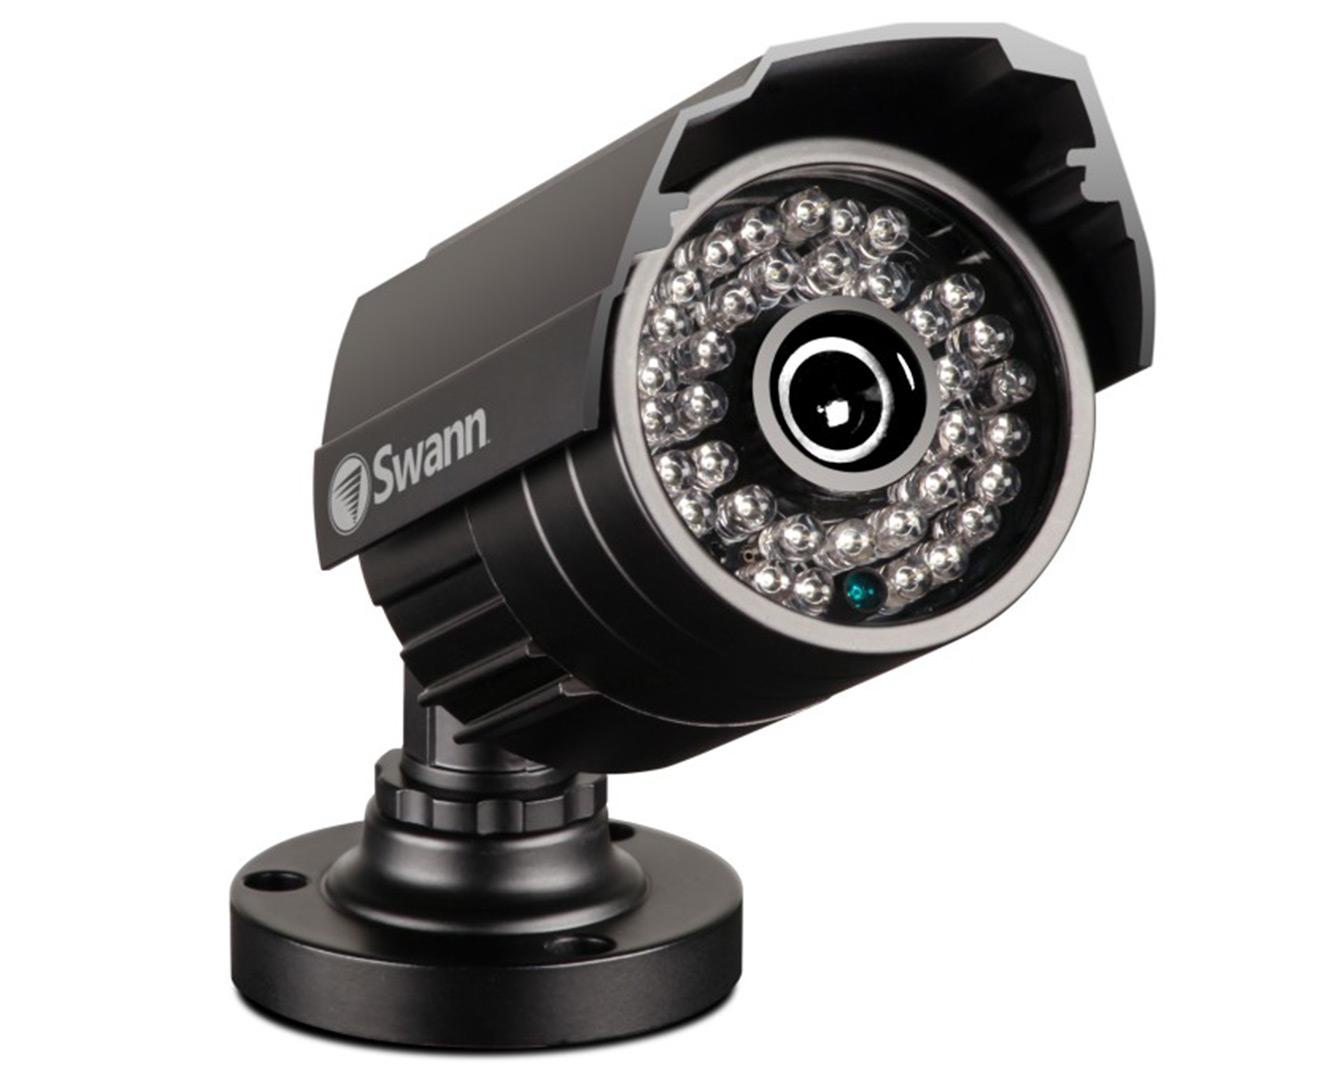 Swann Dvr8-3425 8-channel Bullet Dvr W   8 X Pro-735 Cameras